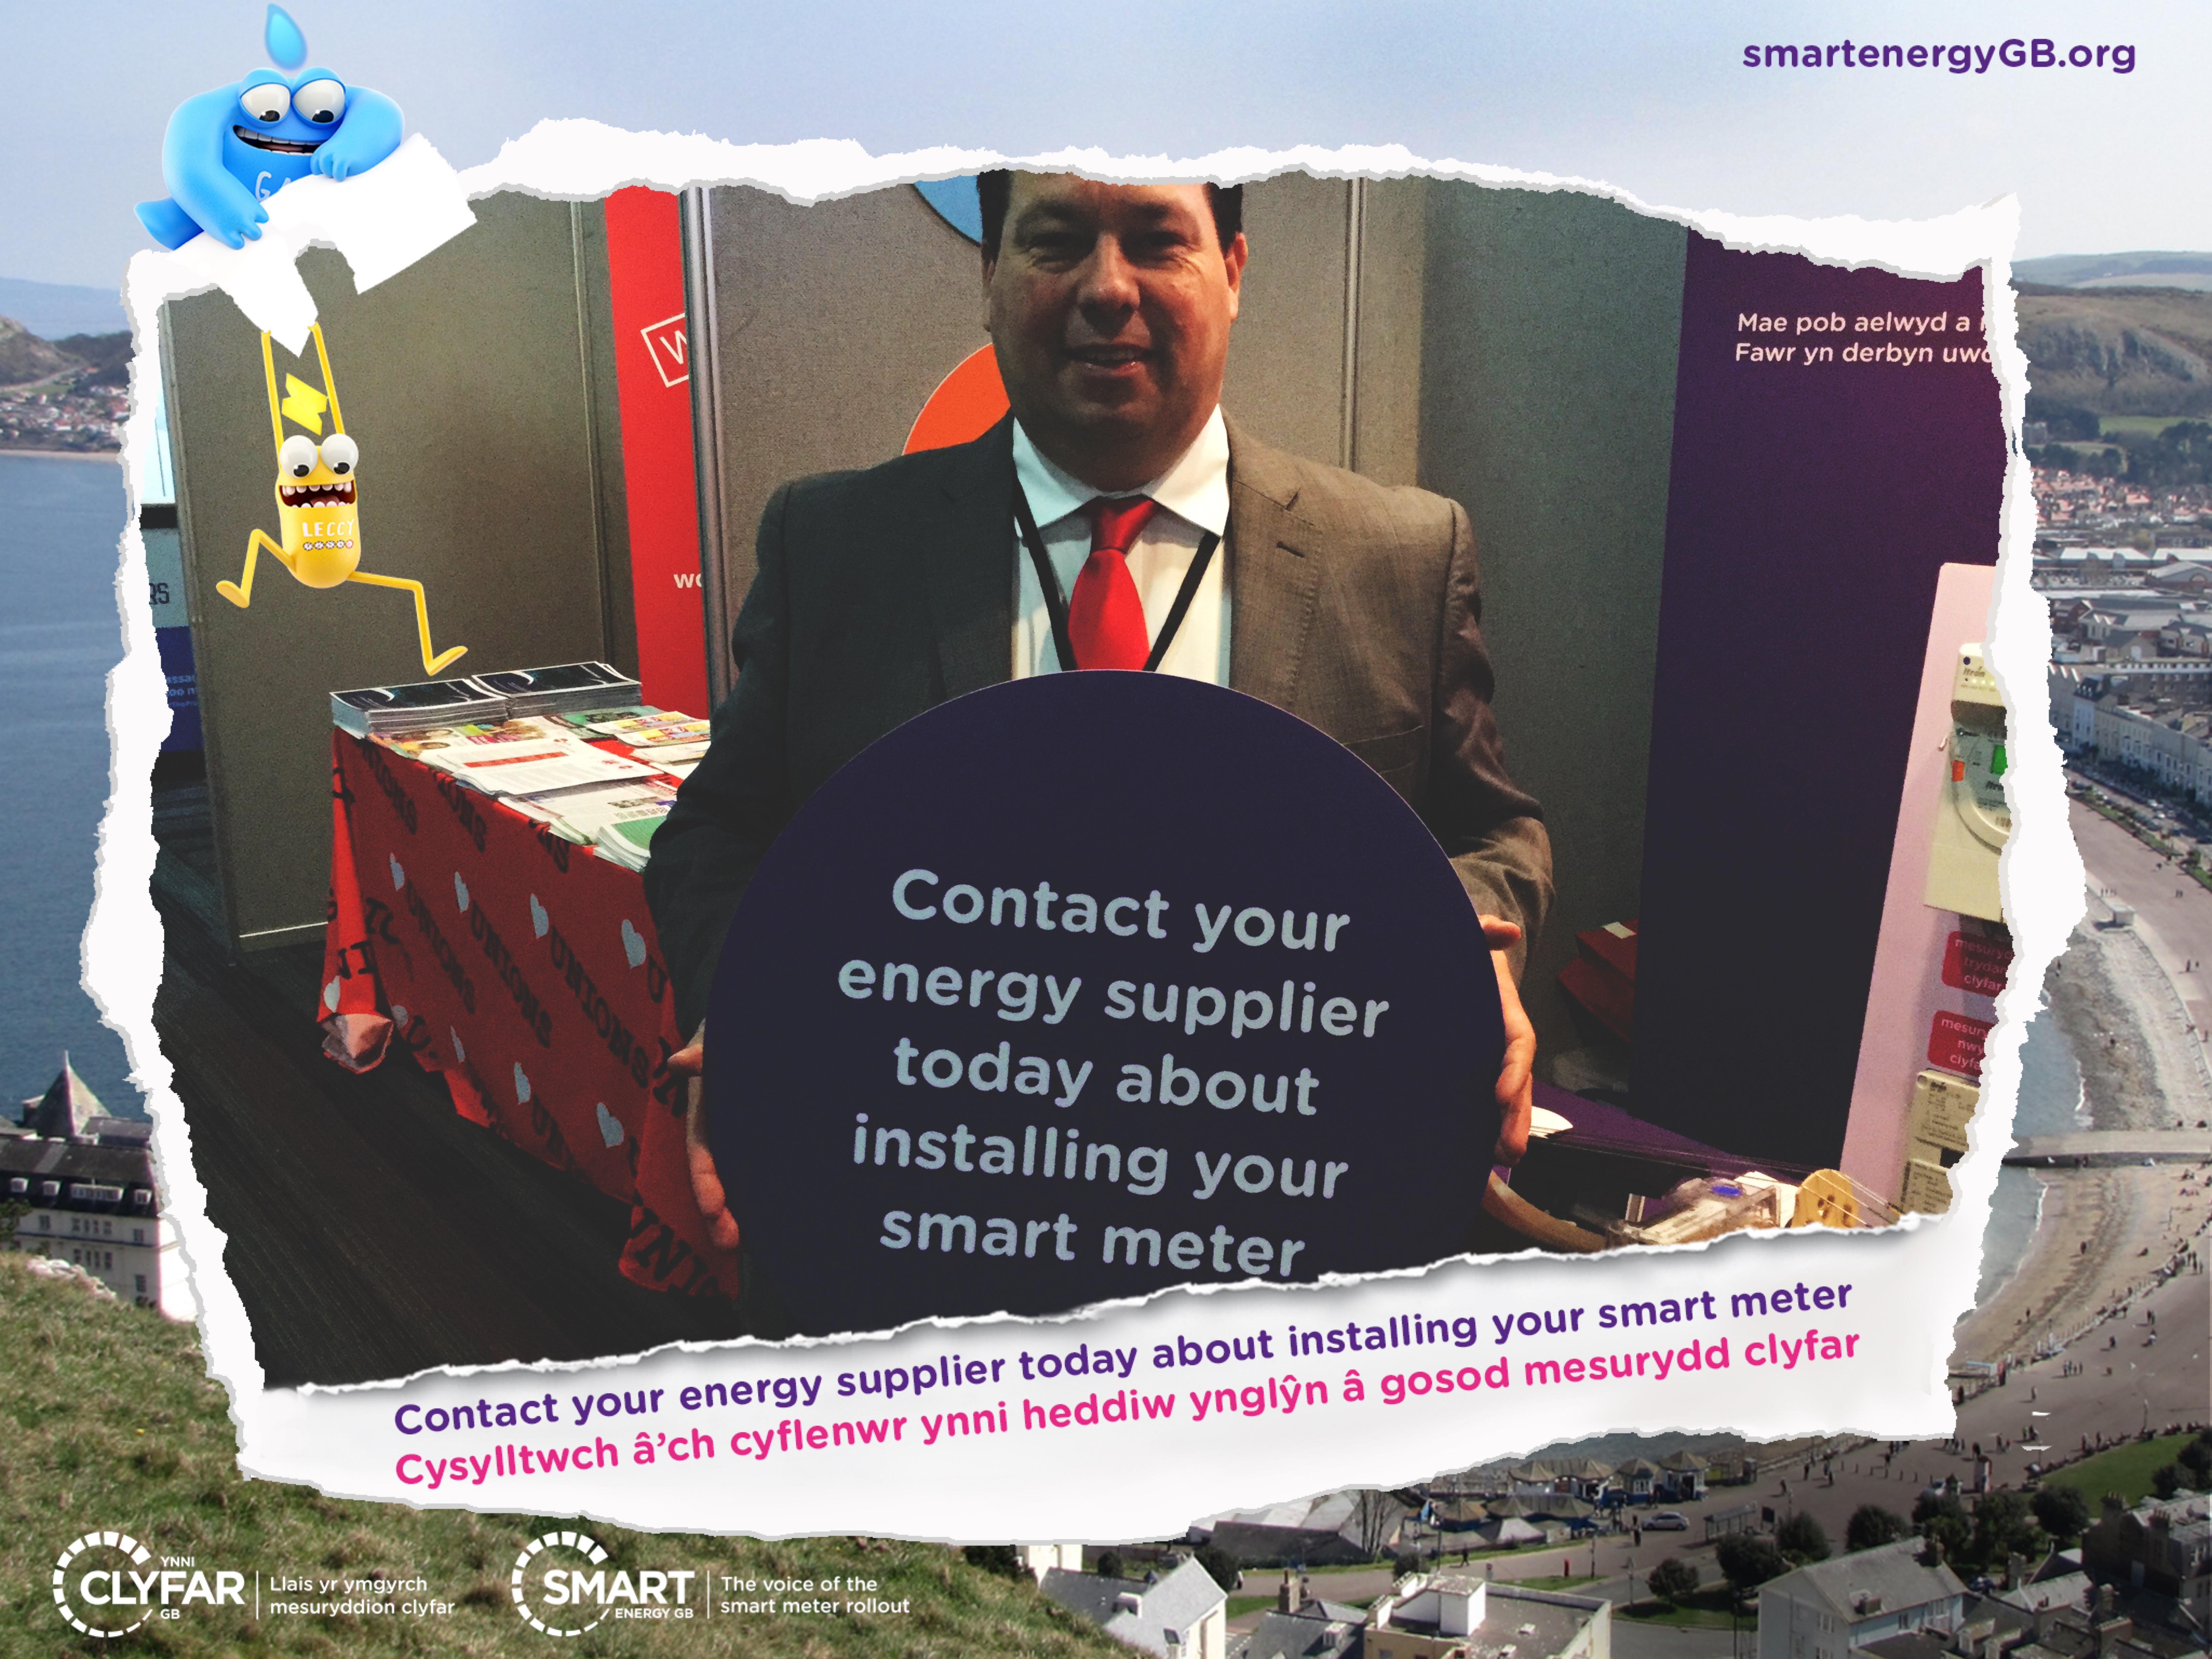 Smart_Energy_GB_pic.JPG